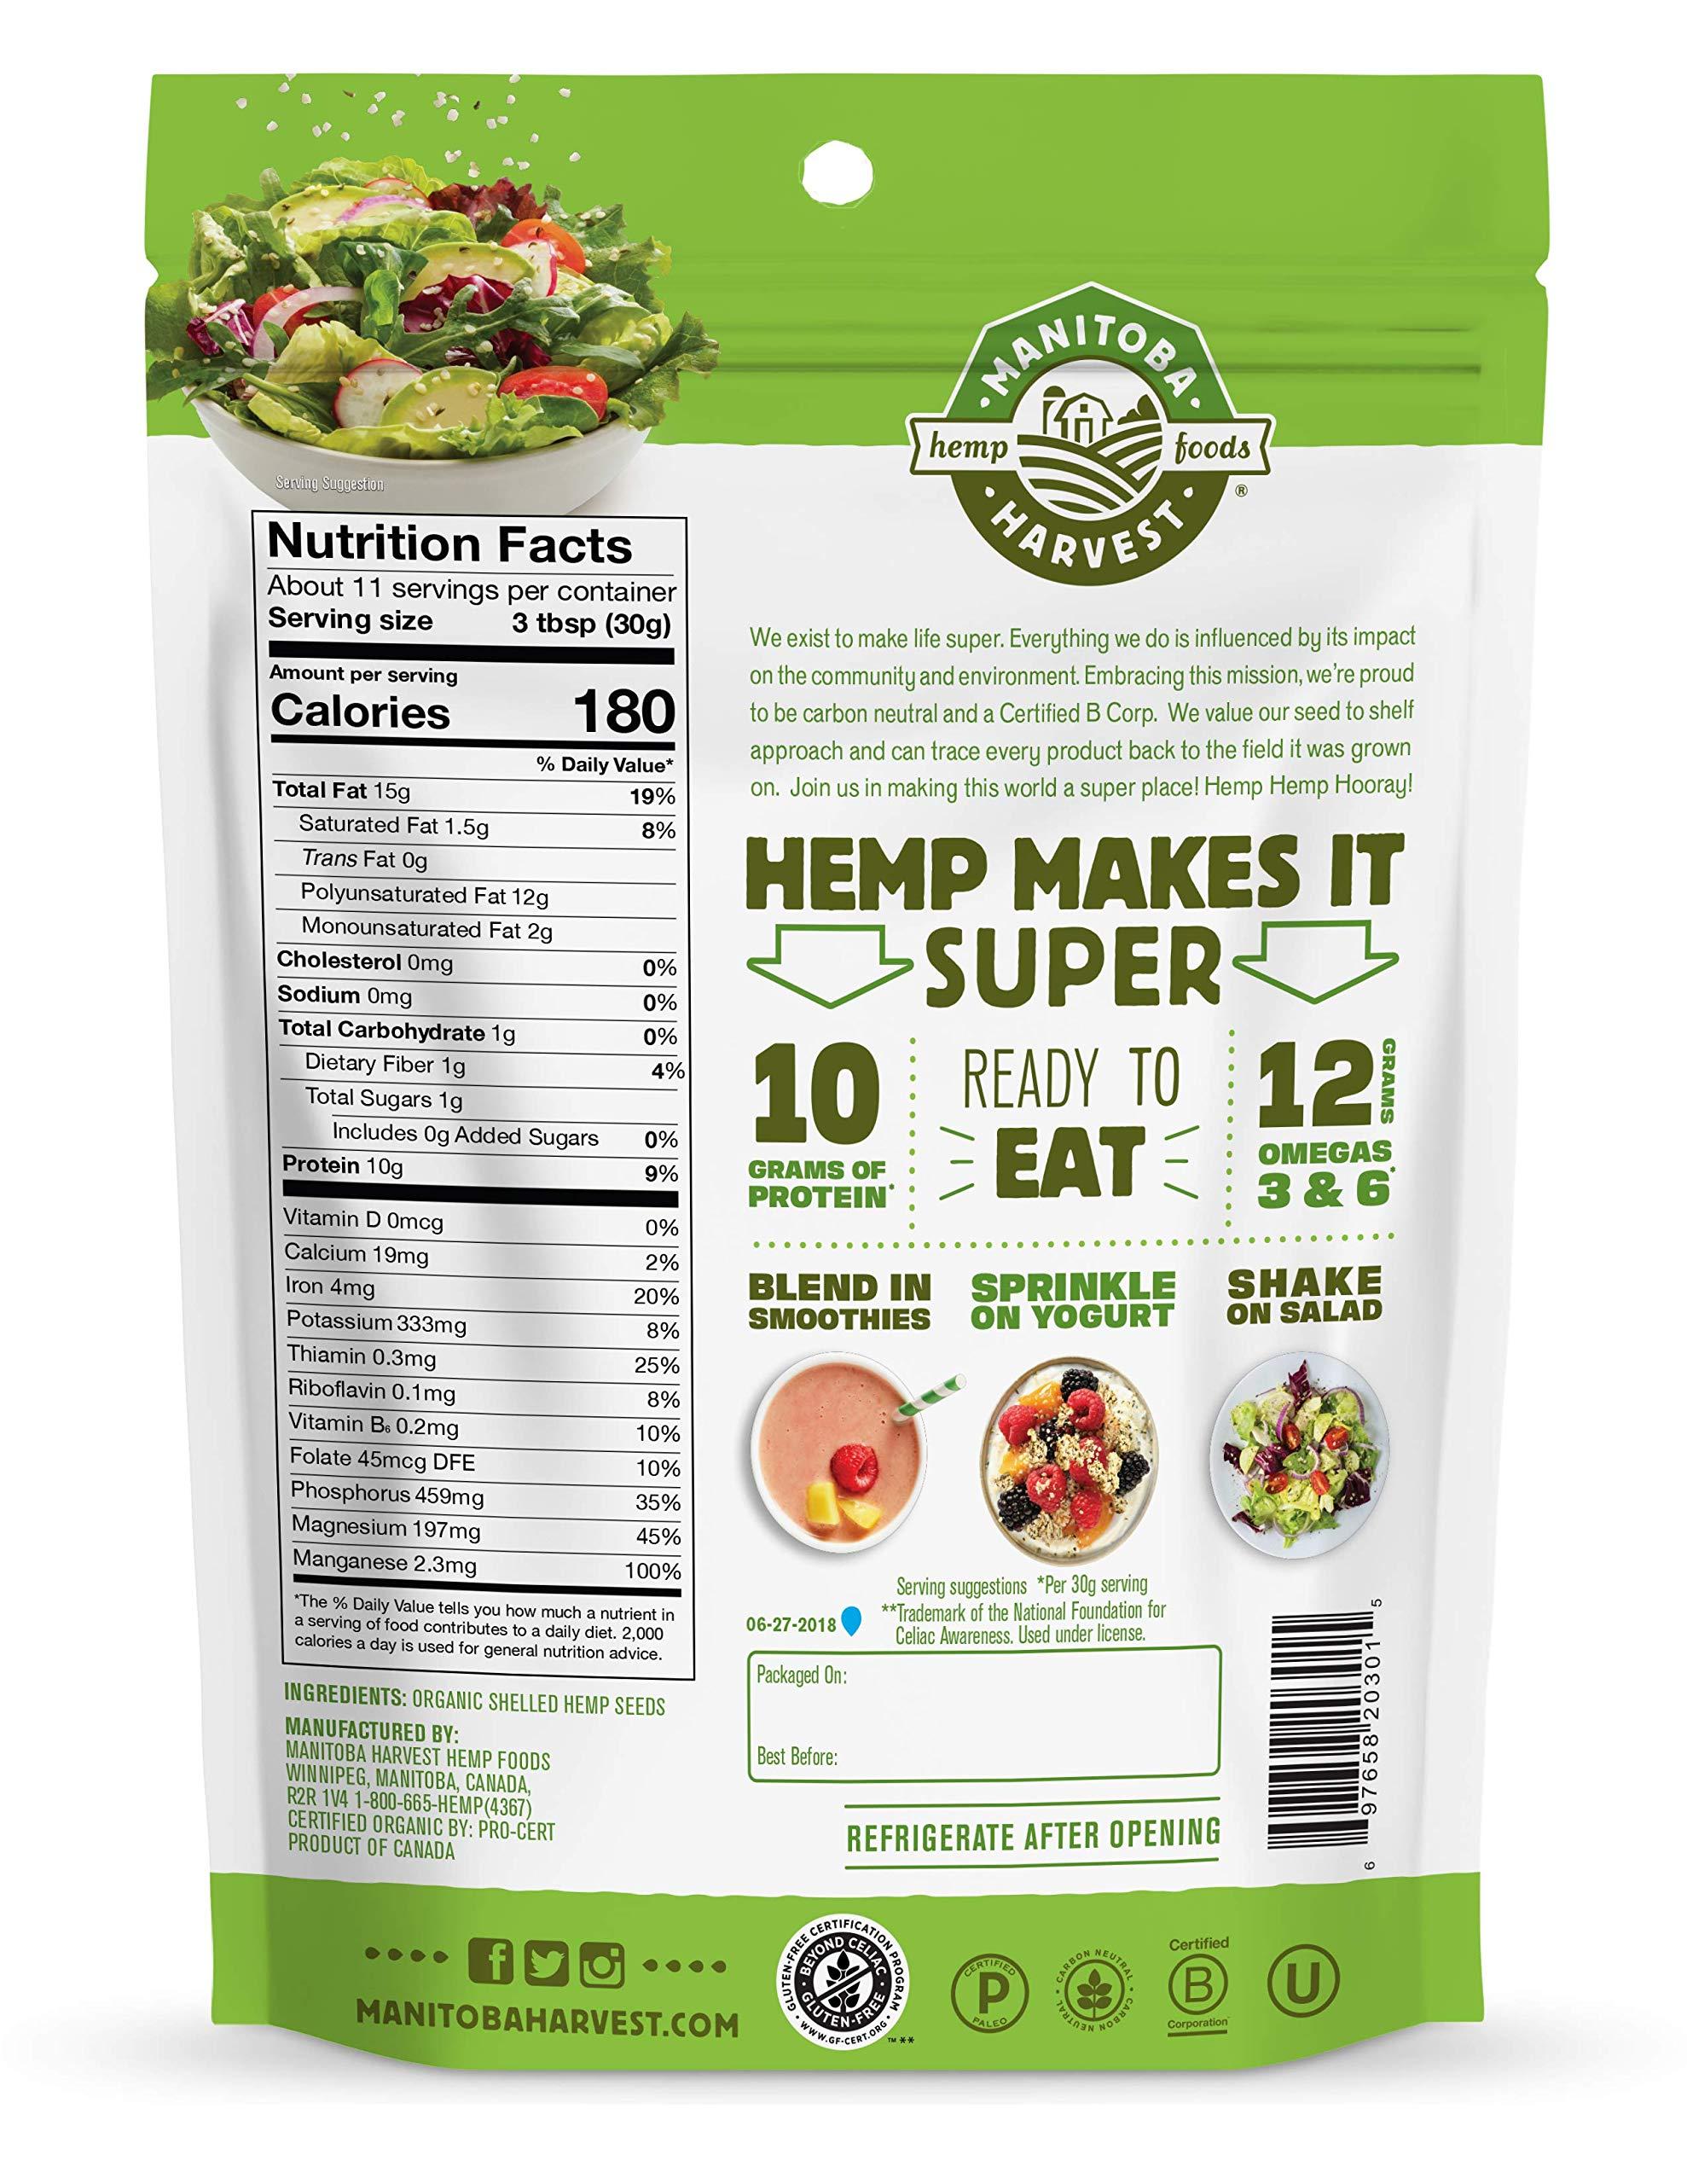 Manitoba Harvest Organic Hemp Hearts Raw Shelled Hemp Seeds, 12oz; with 10g Protein & Omegas per Serving, Non-GMO, Gluten Free by Manitoba Harvest (Image #2)